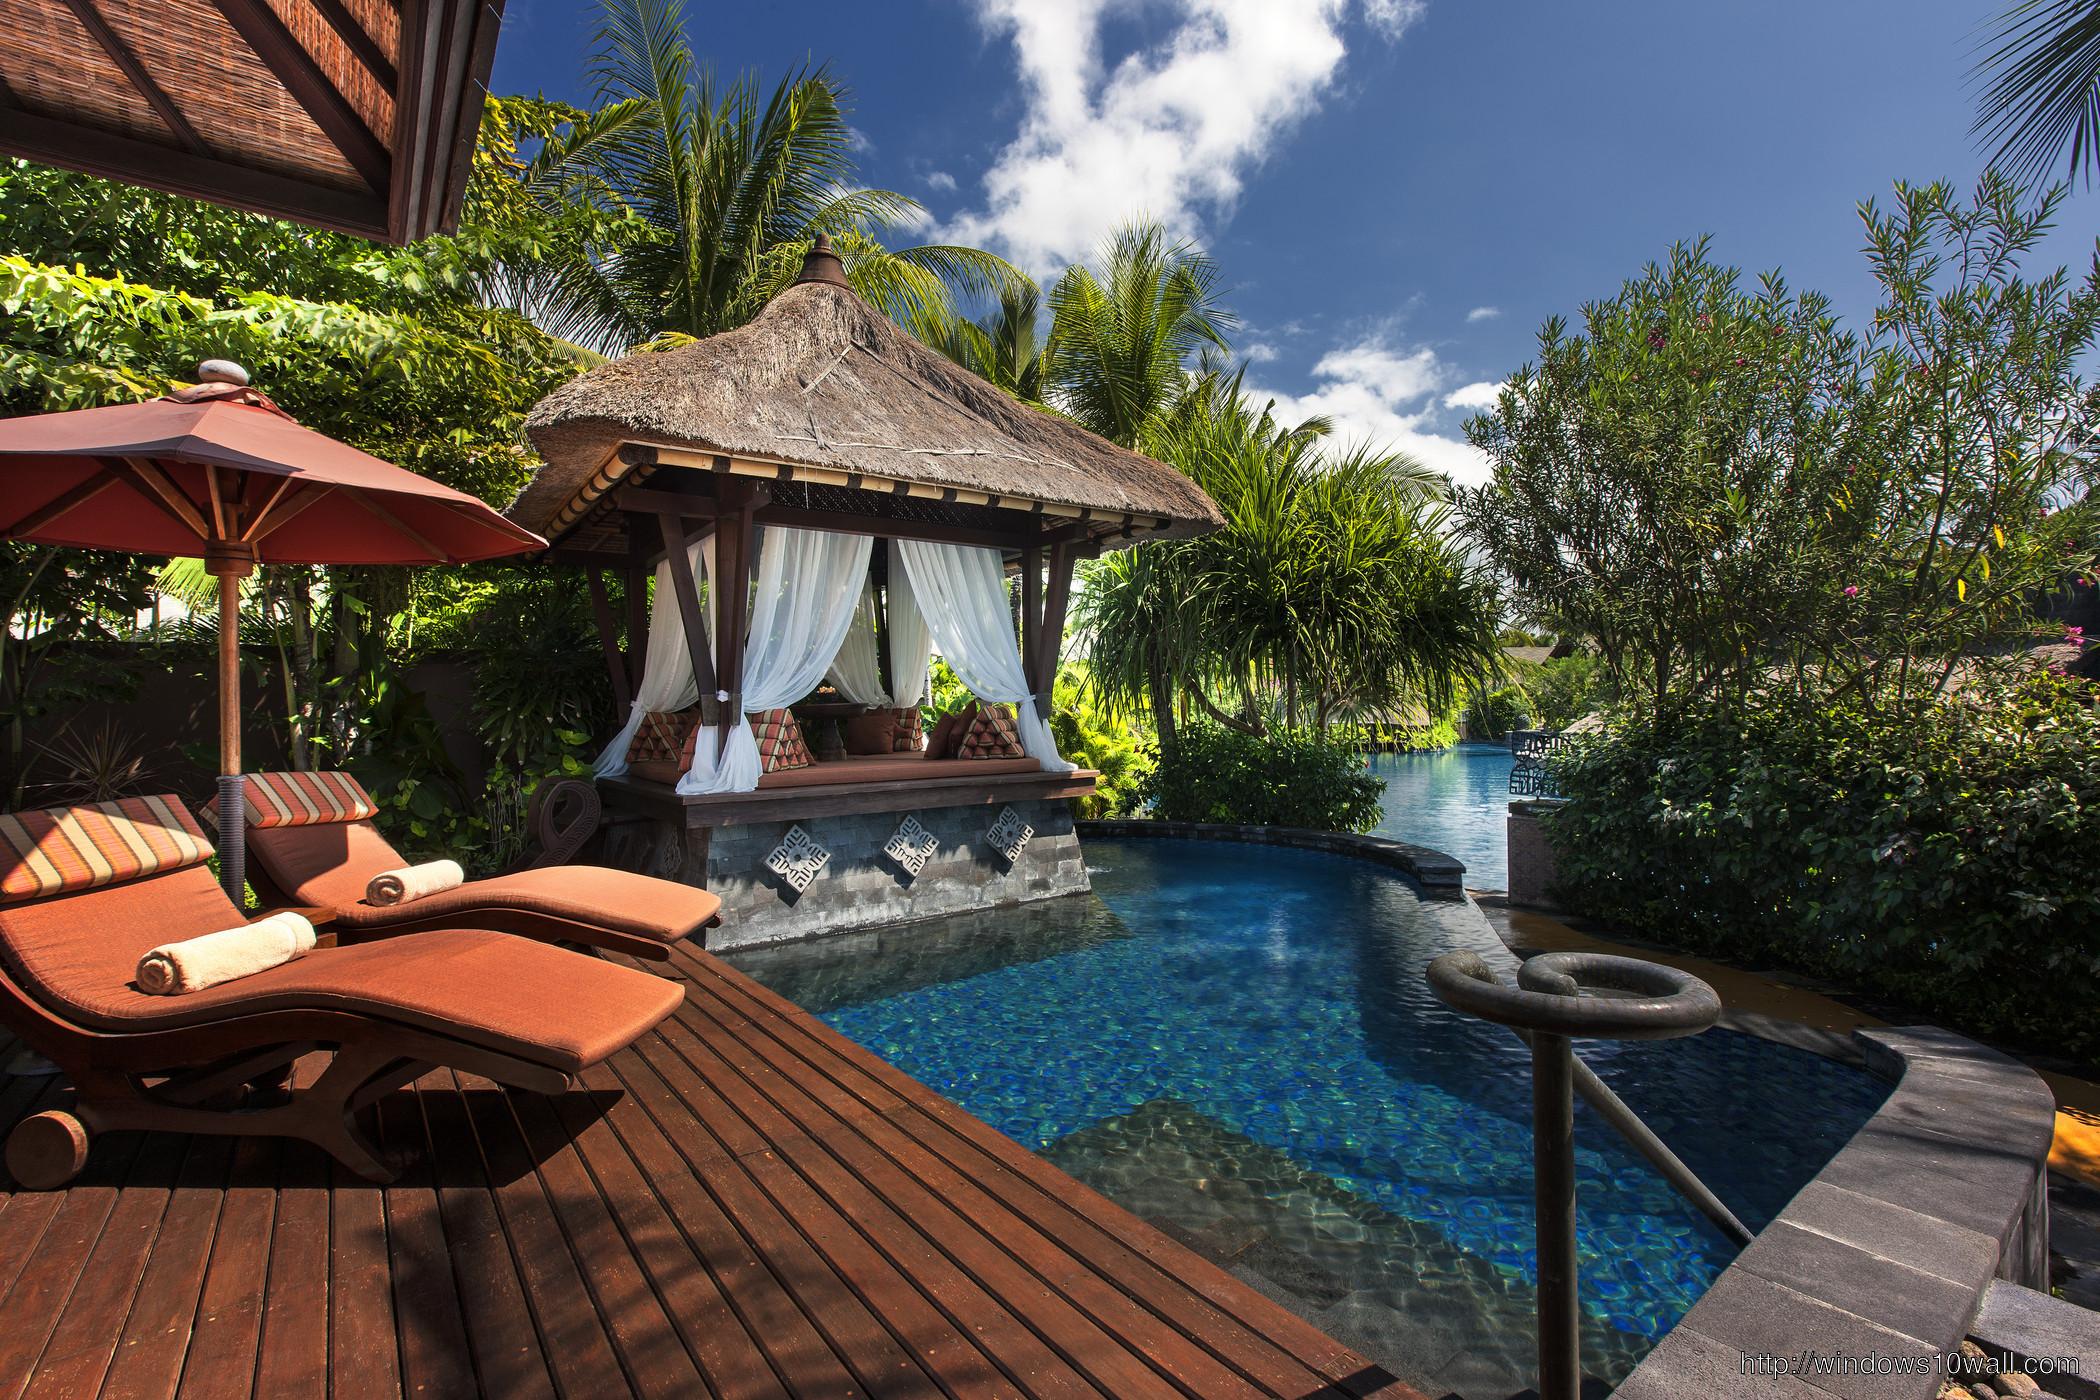 Bali Resorts Rooms Travel Wallpaper